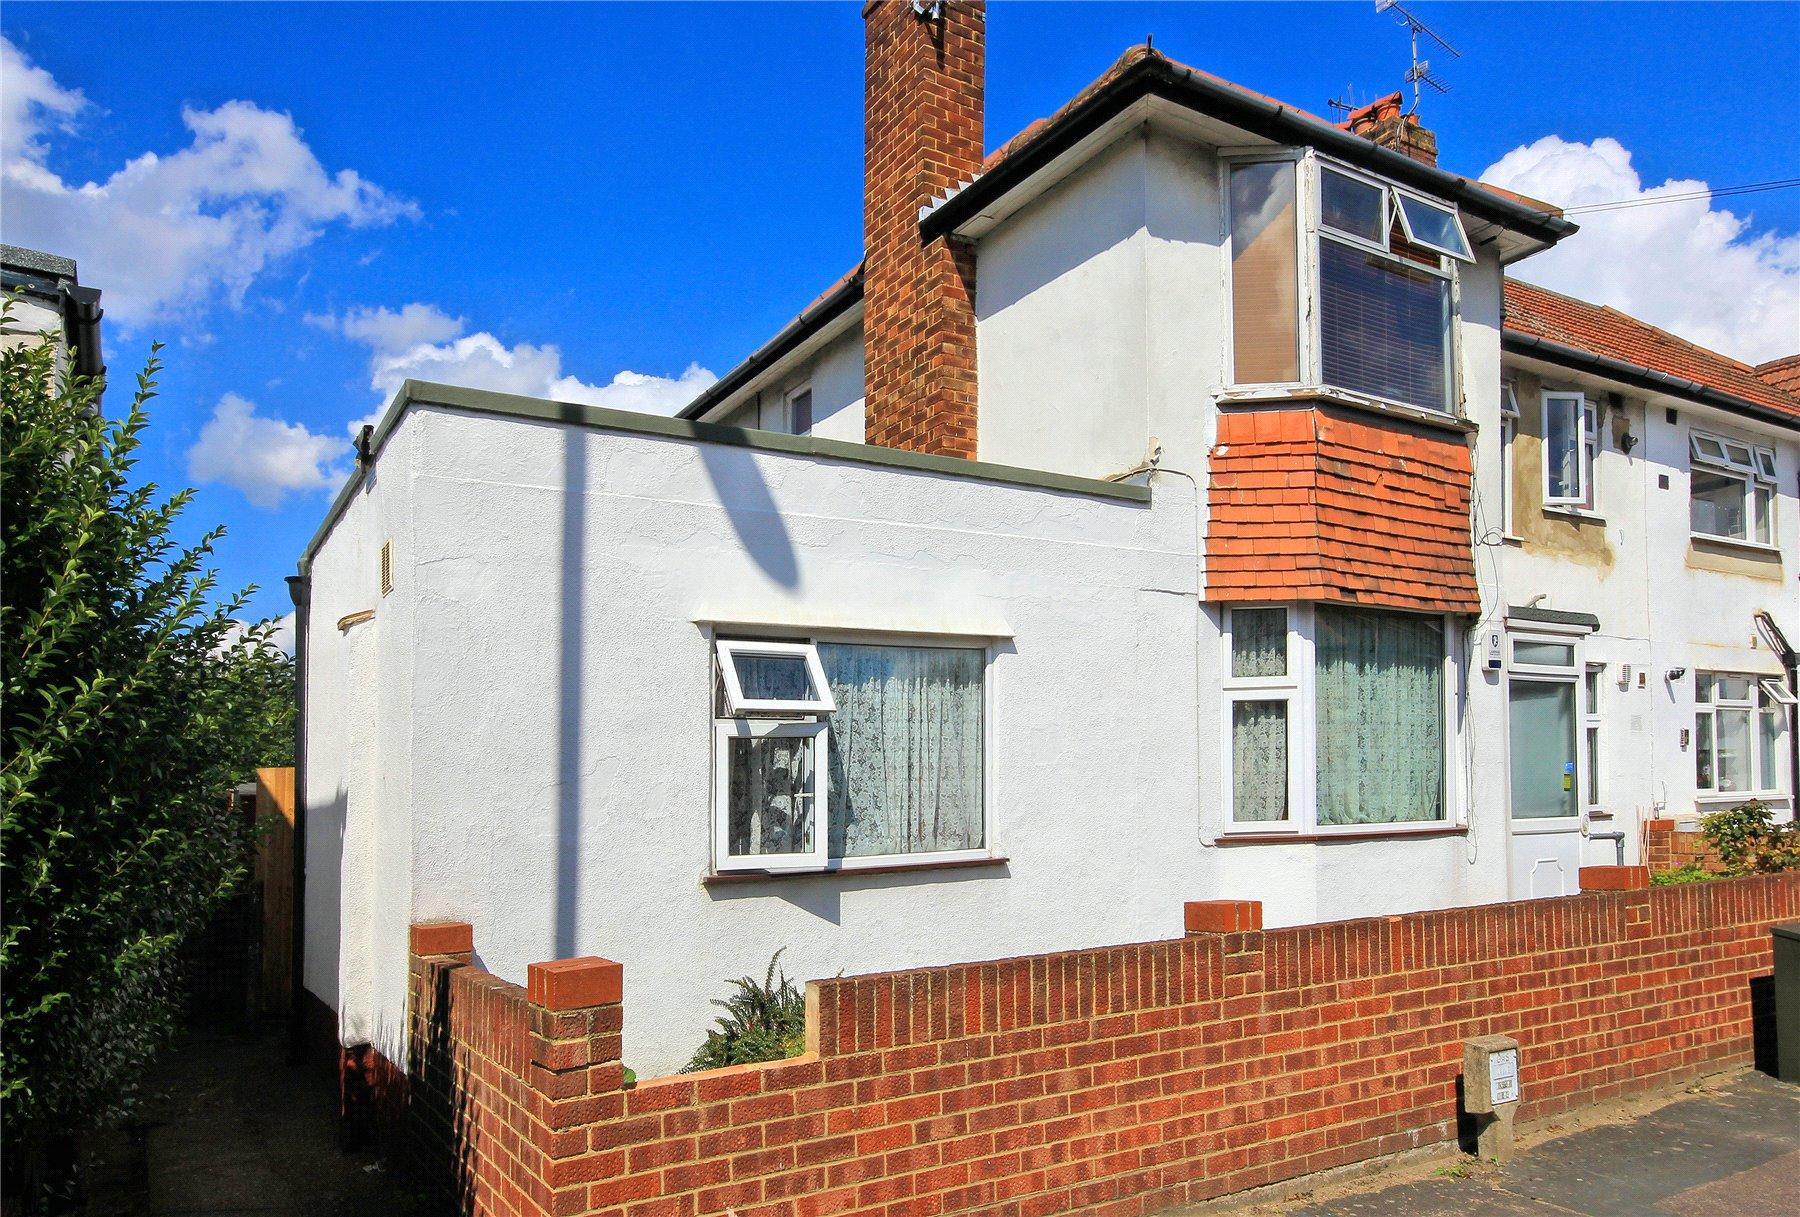 3 Bedrooms Maisonette Flat for sale in Eve Road, Woking, Surrey, GU21